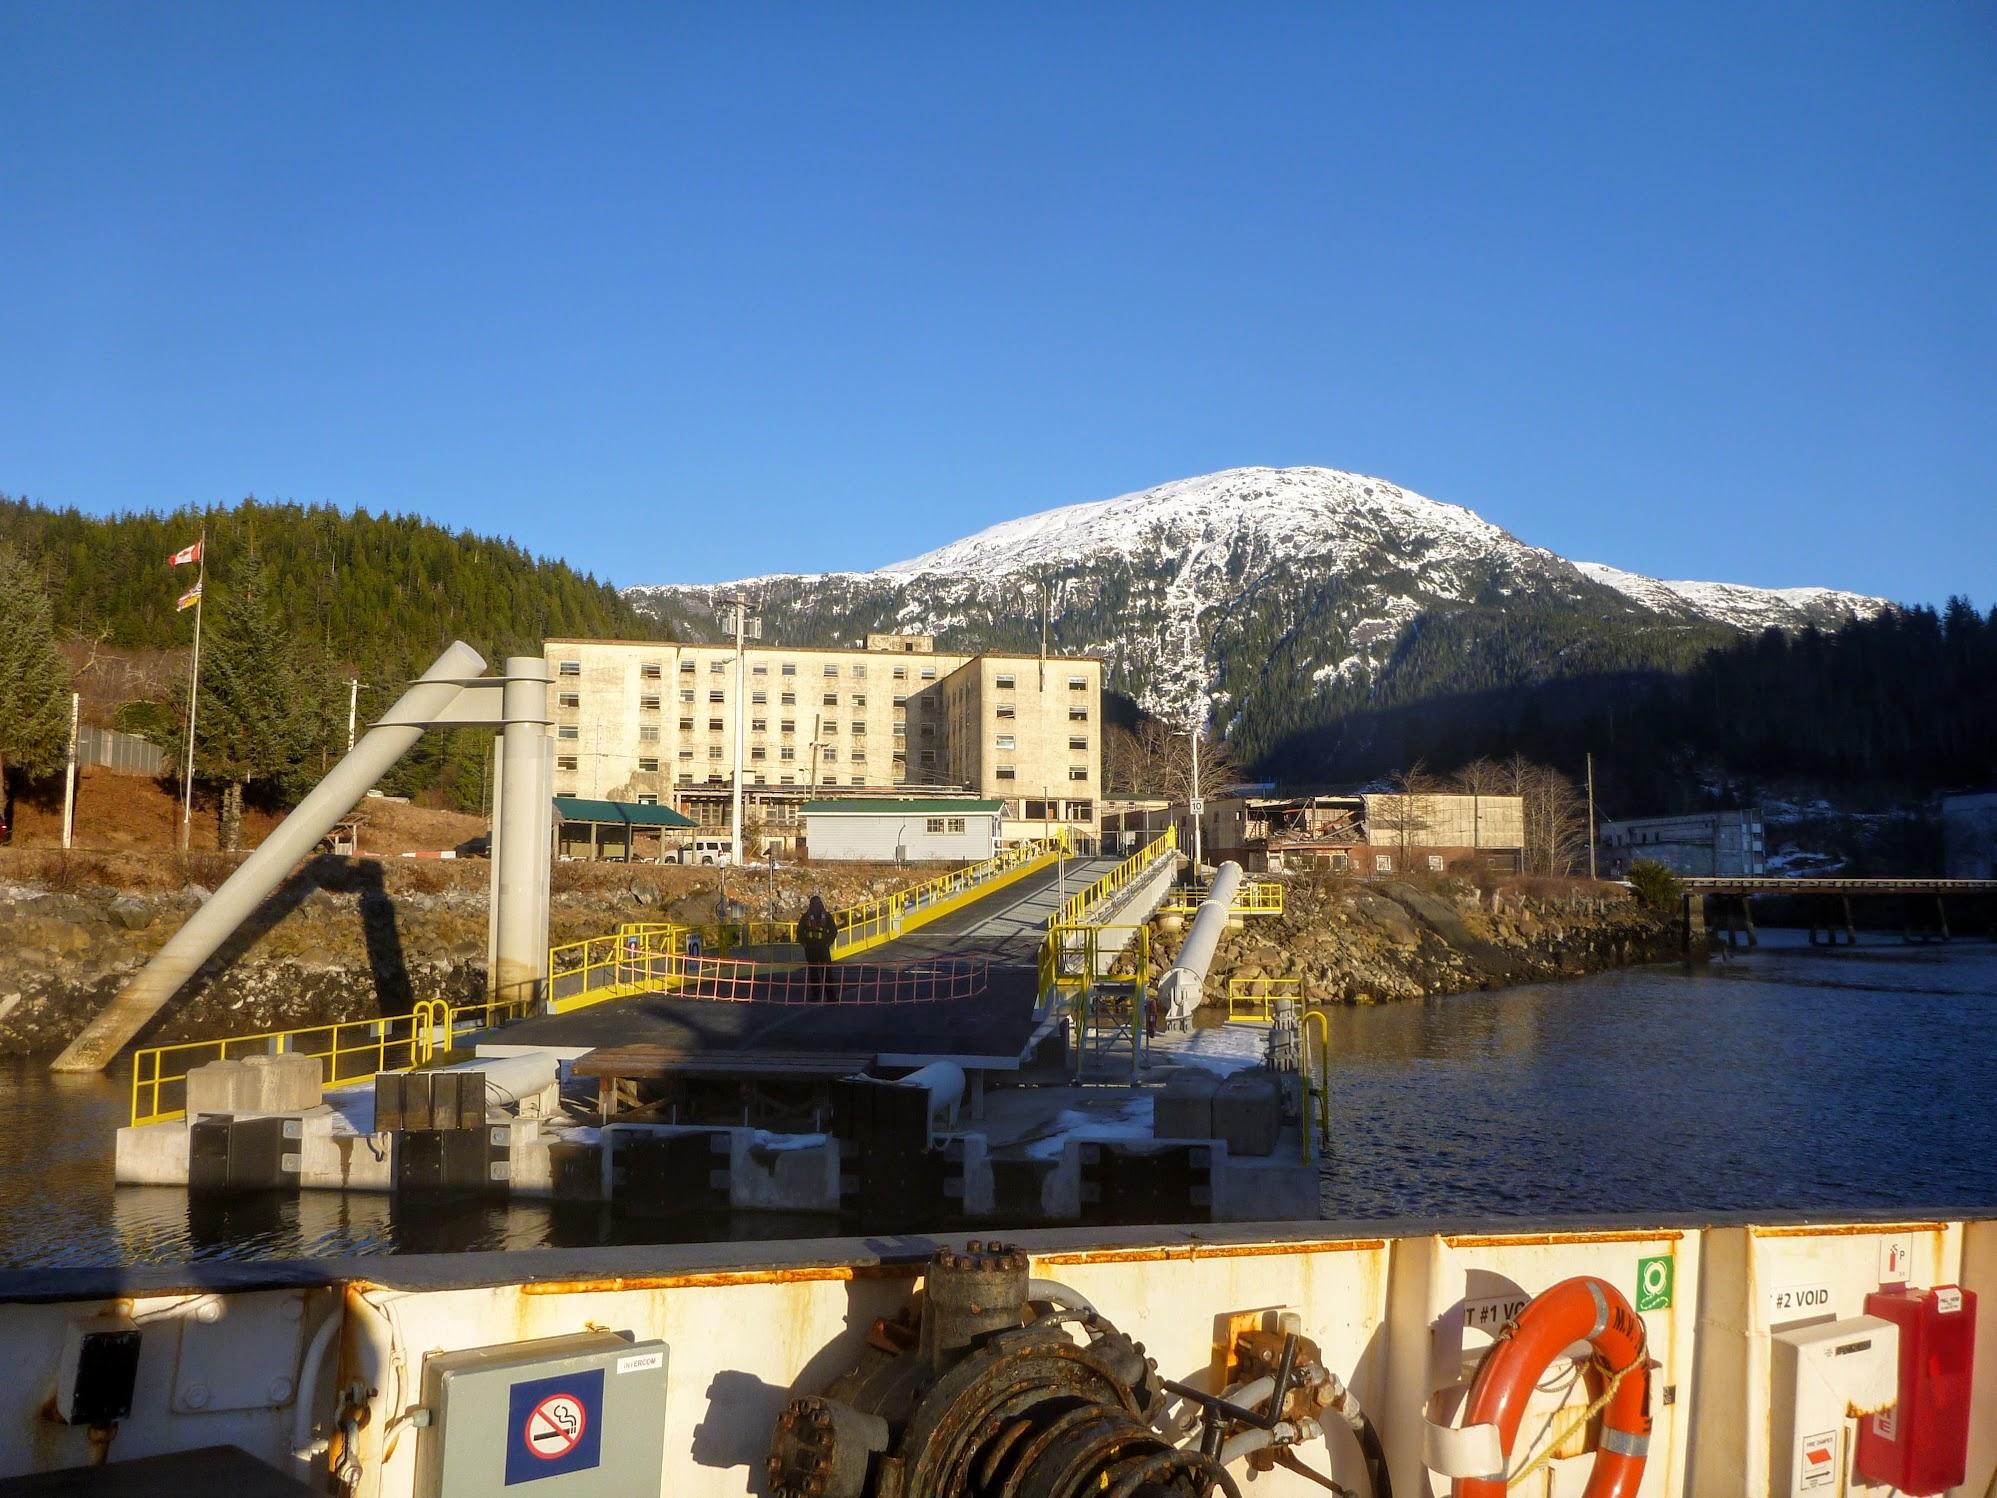 Arriving at Ocean Fall's fancy new dock.